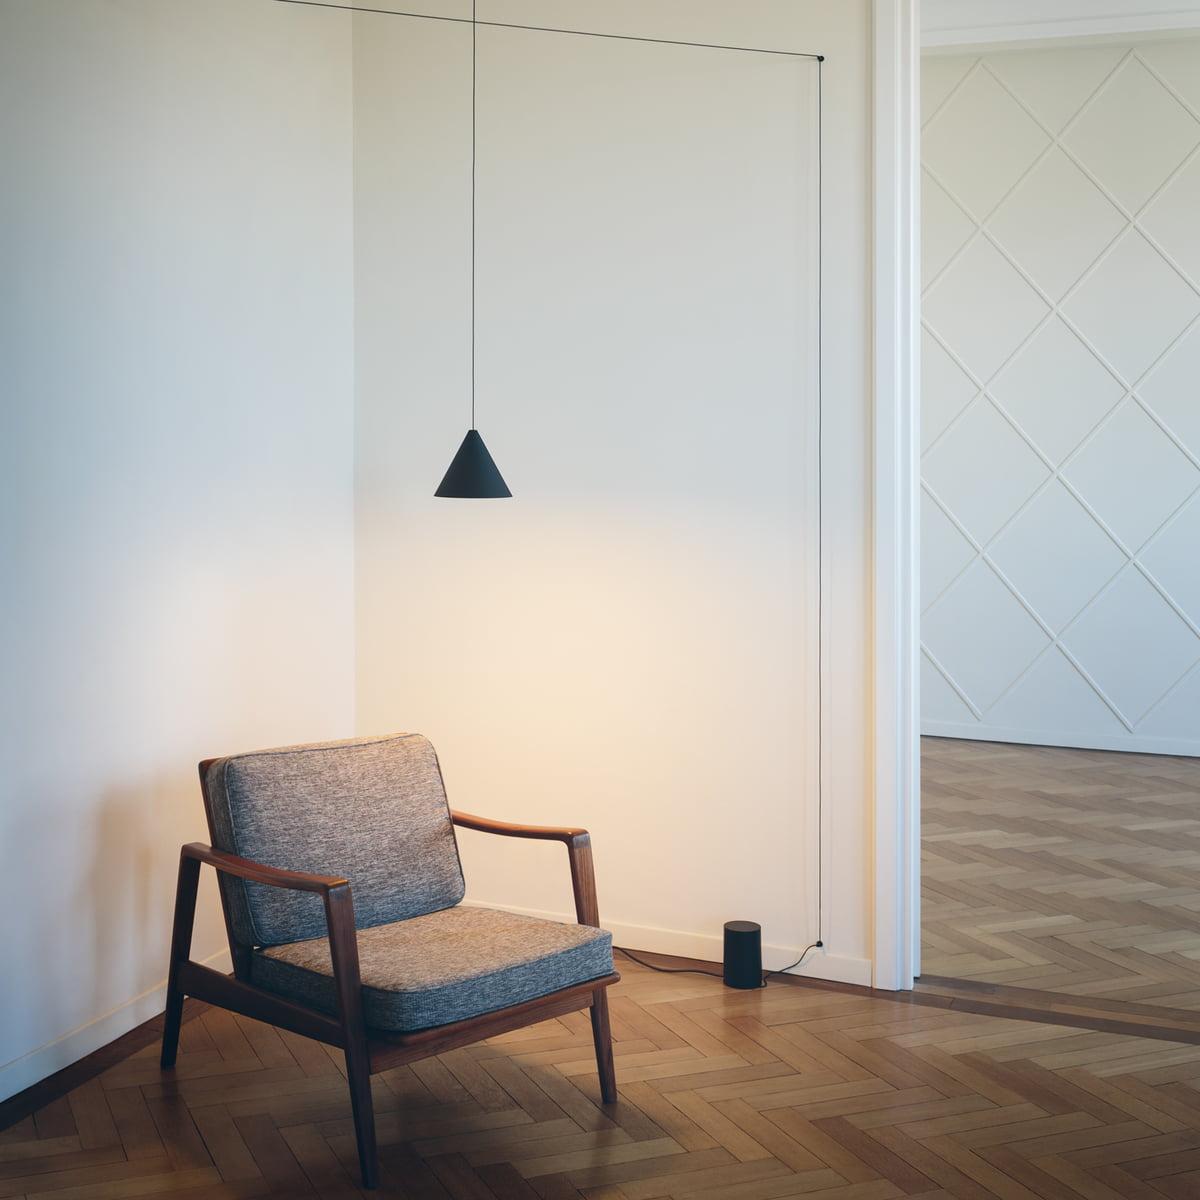 flos string light pendant lamp conical head